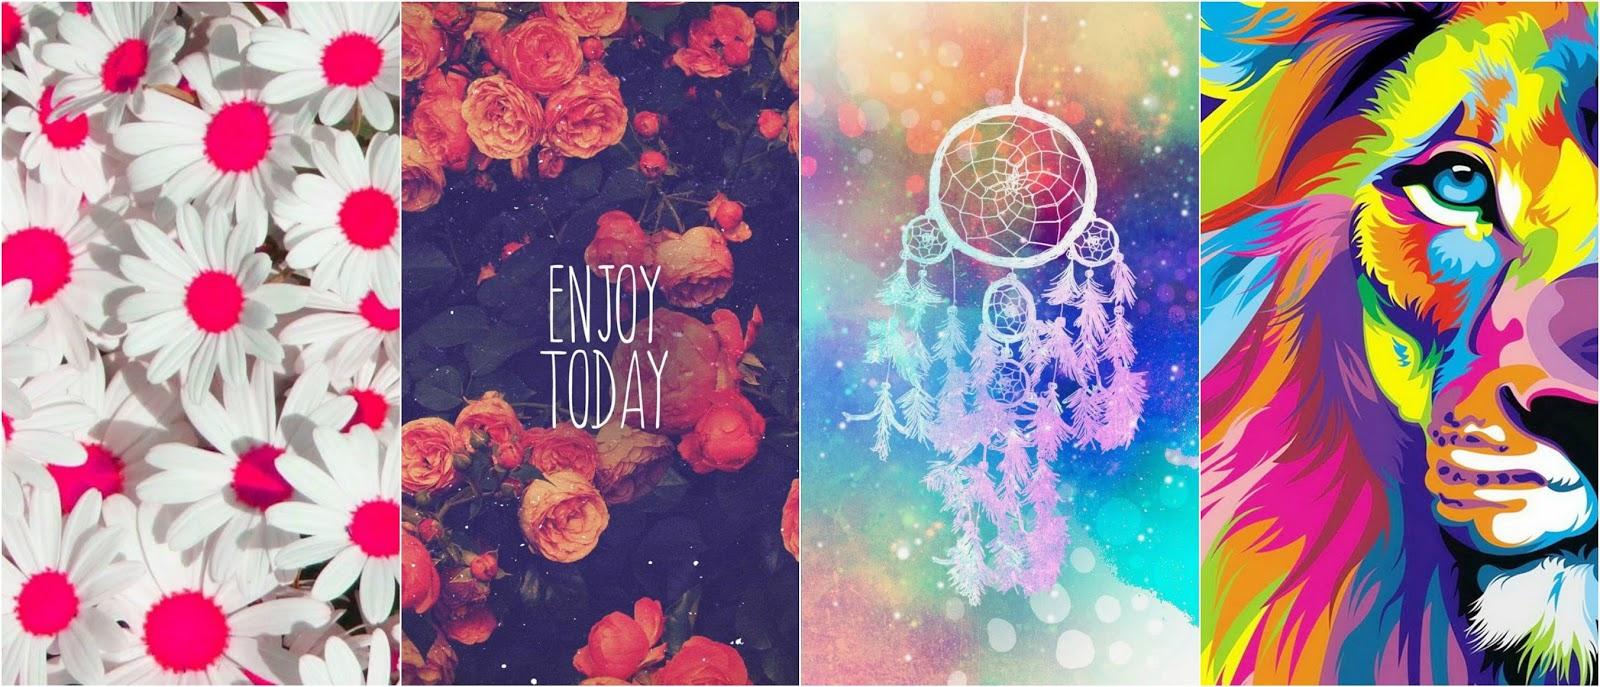 Super Amora Rosa: Wallpapers Fofos para o Celular! CX23